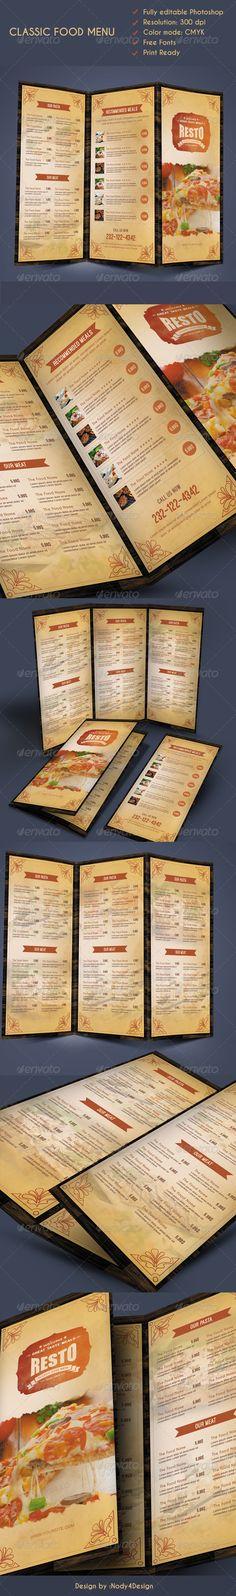 Classic Food Menu Template #design #speisekarte Download: http://graphicriver.net/item/classic-food-menu/8416794?ref=ksioks